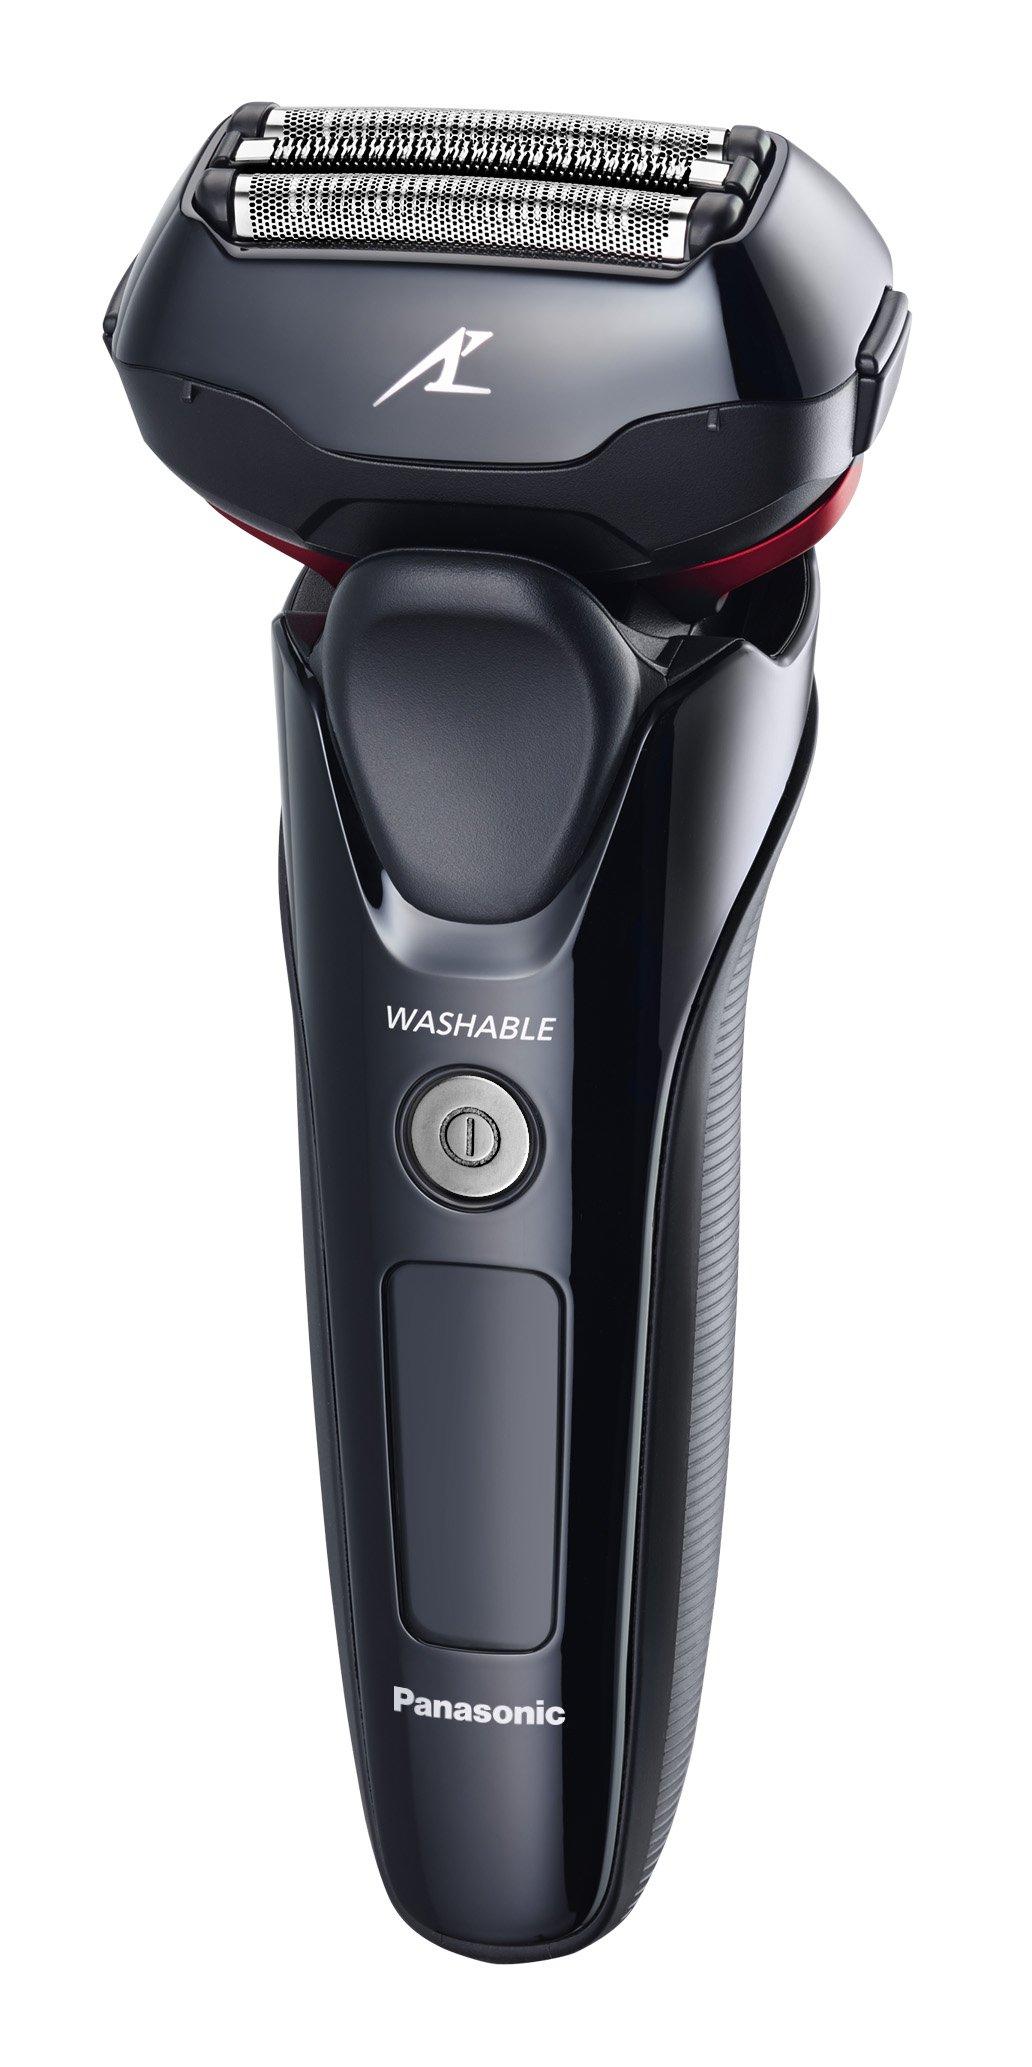 Panasonic randash Men' s Shaver 3-lt2a Blade black ES K